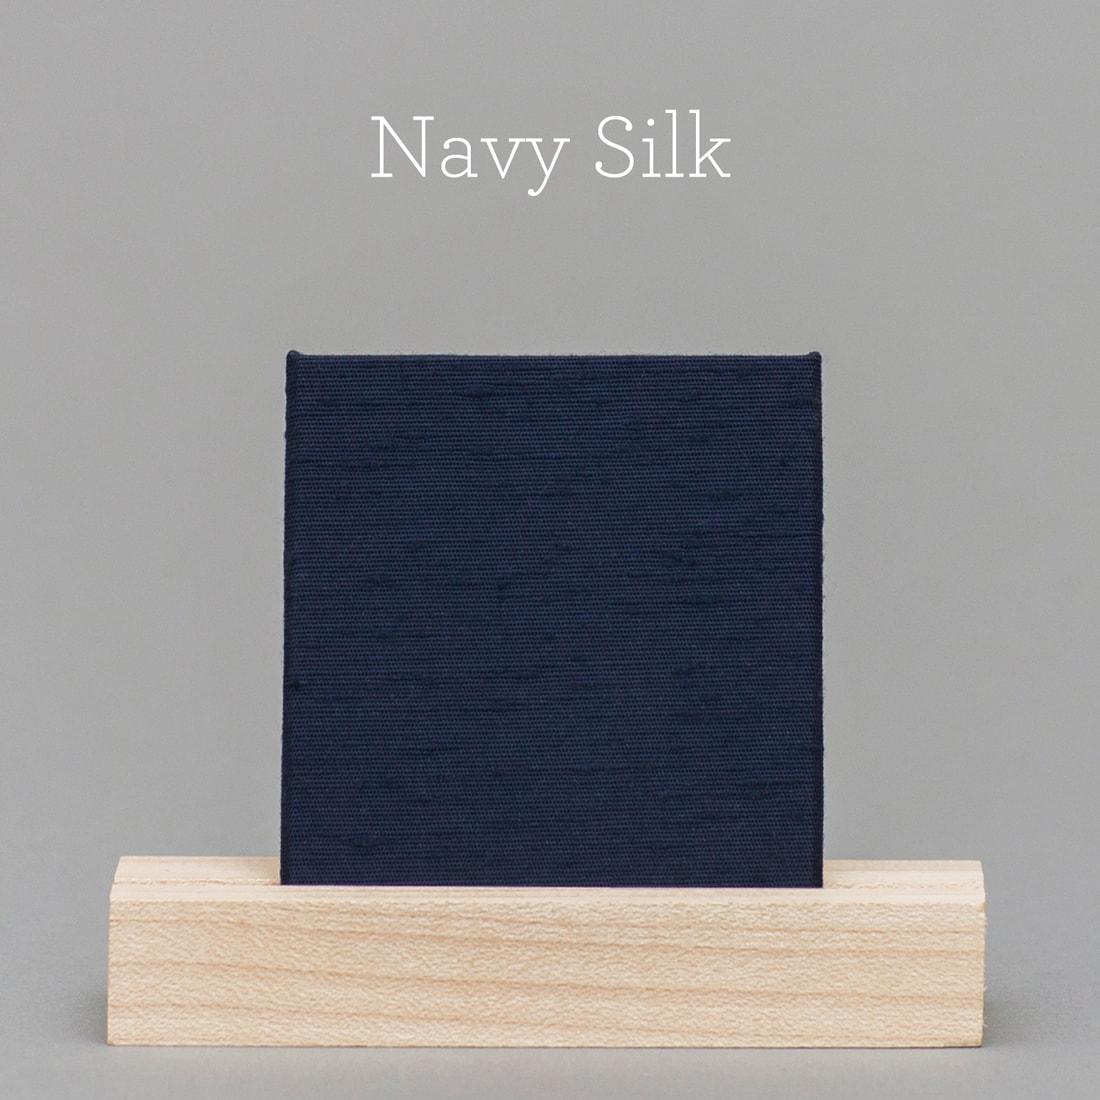 NavySilk.jpg